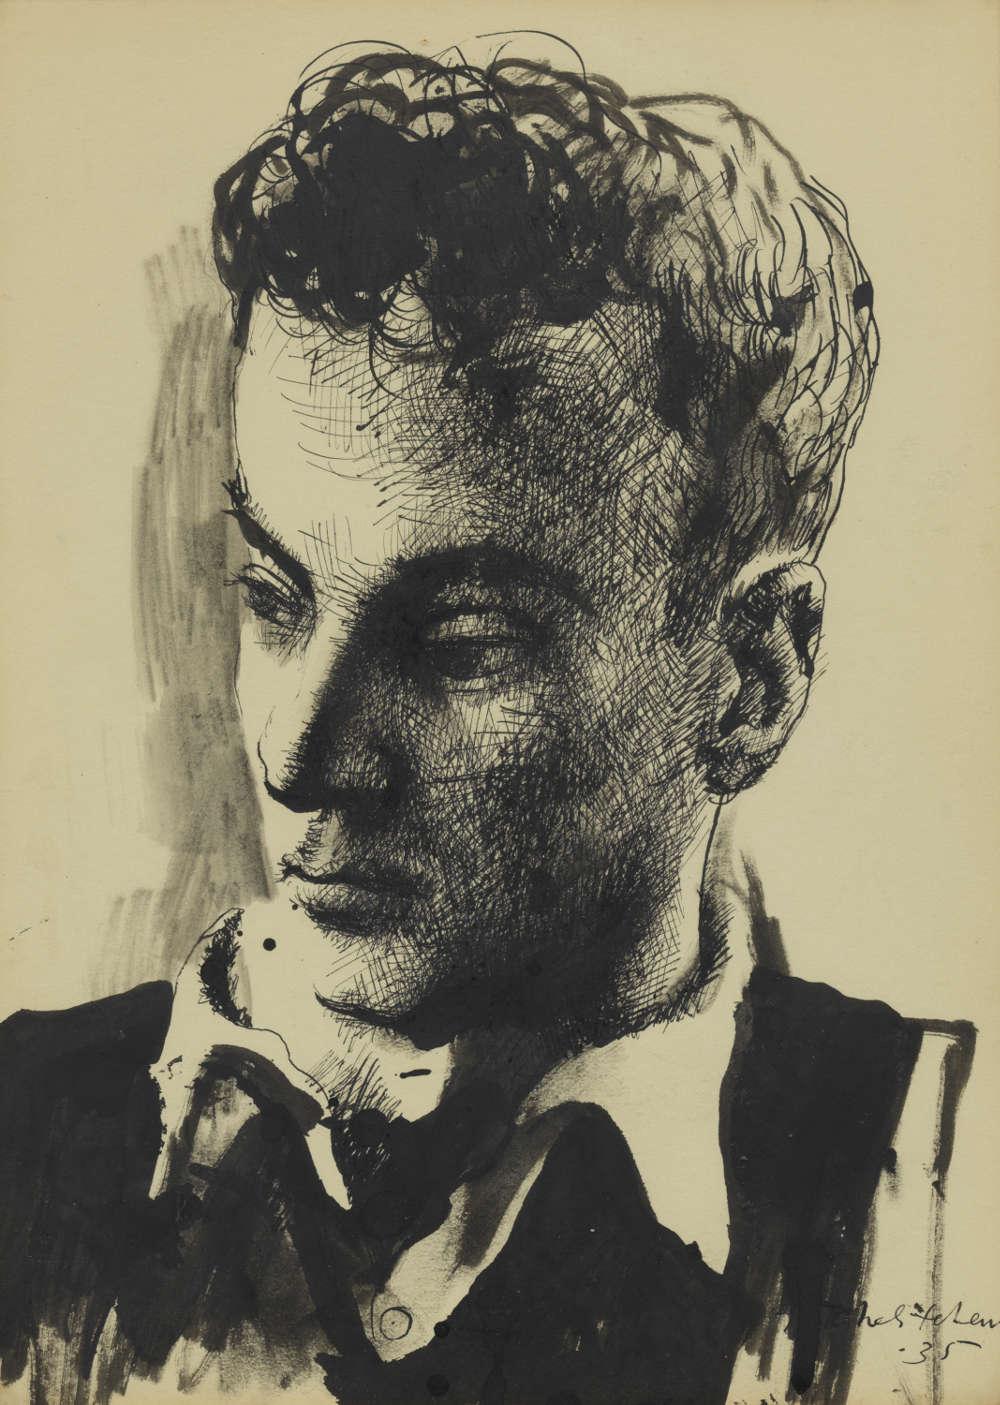 Pavel Tchelitchew, Portrait, 1935